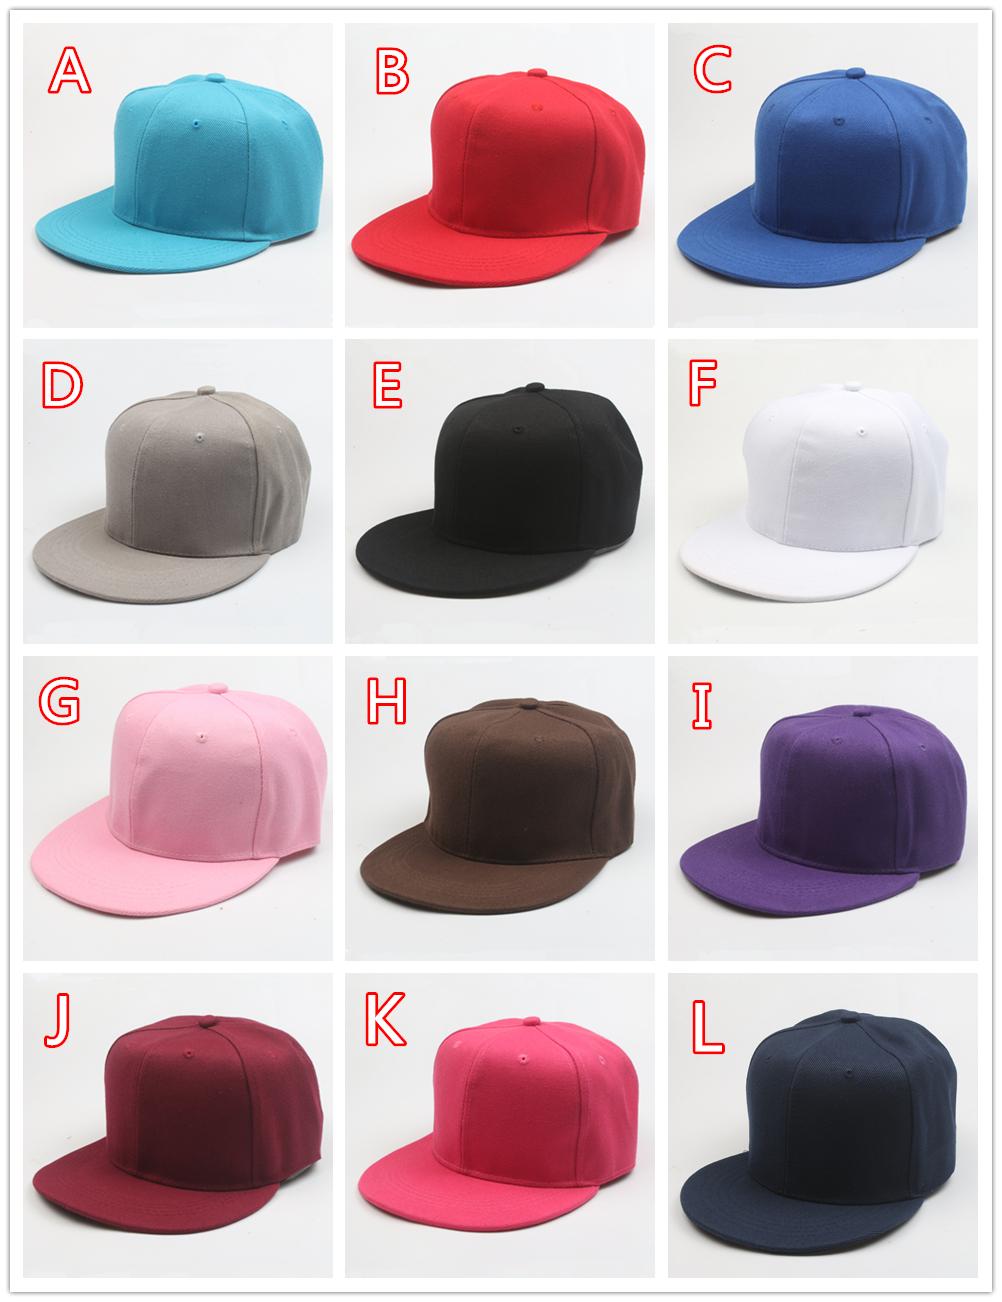 063997e4c46 Adult Children Custom Baseball Cap LOGO Embroidery Kick Hat 3D ...